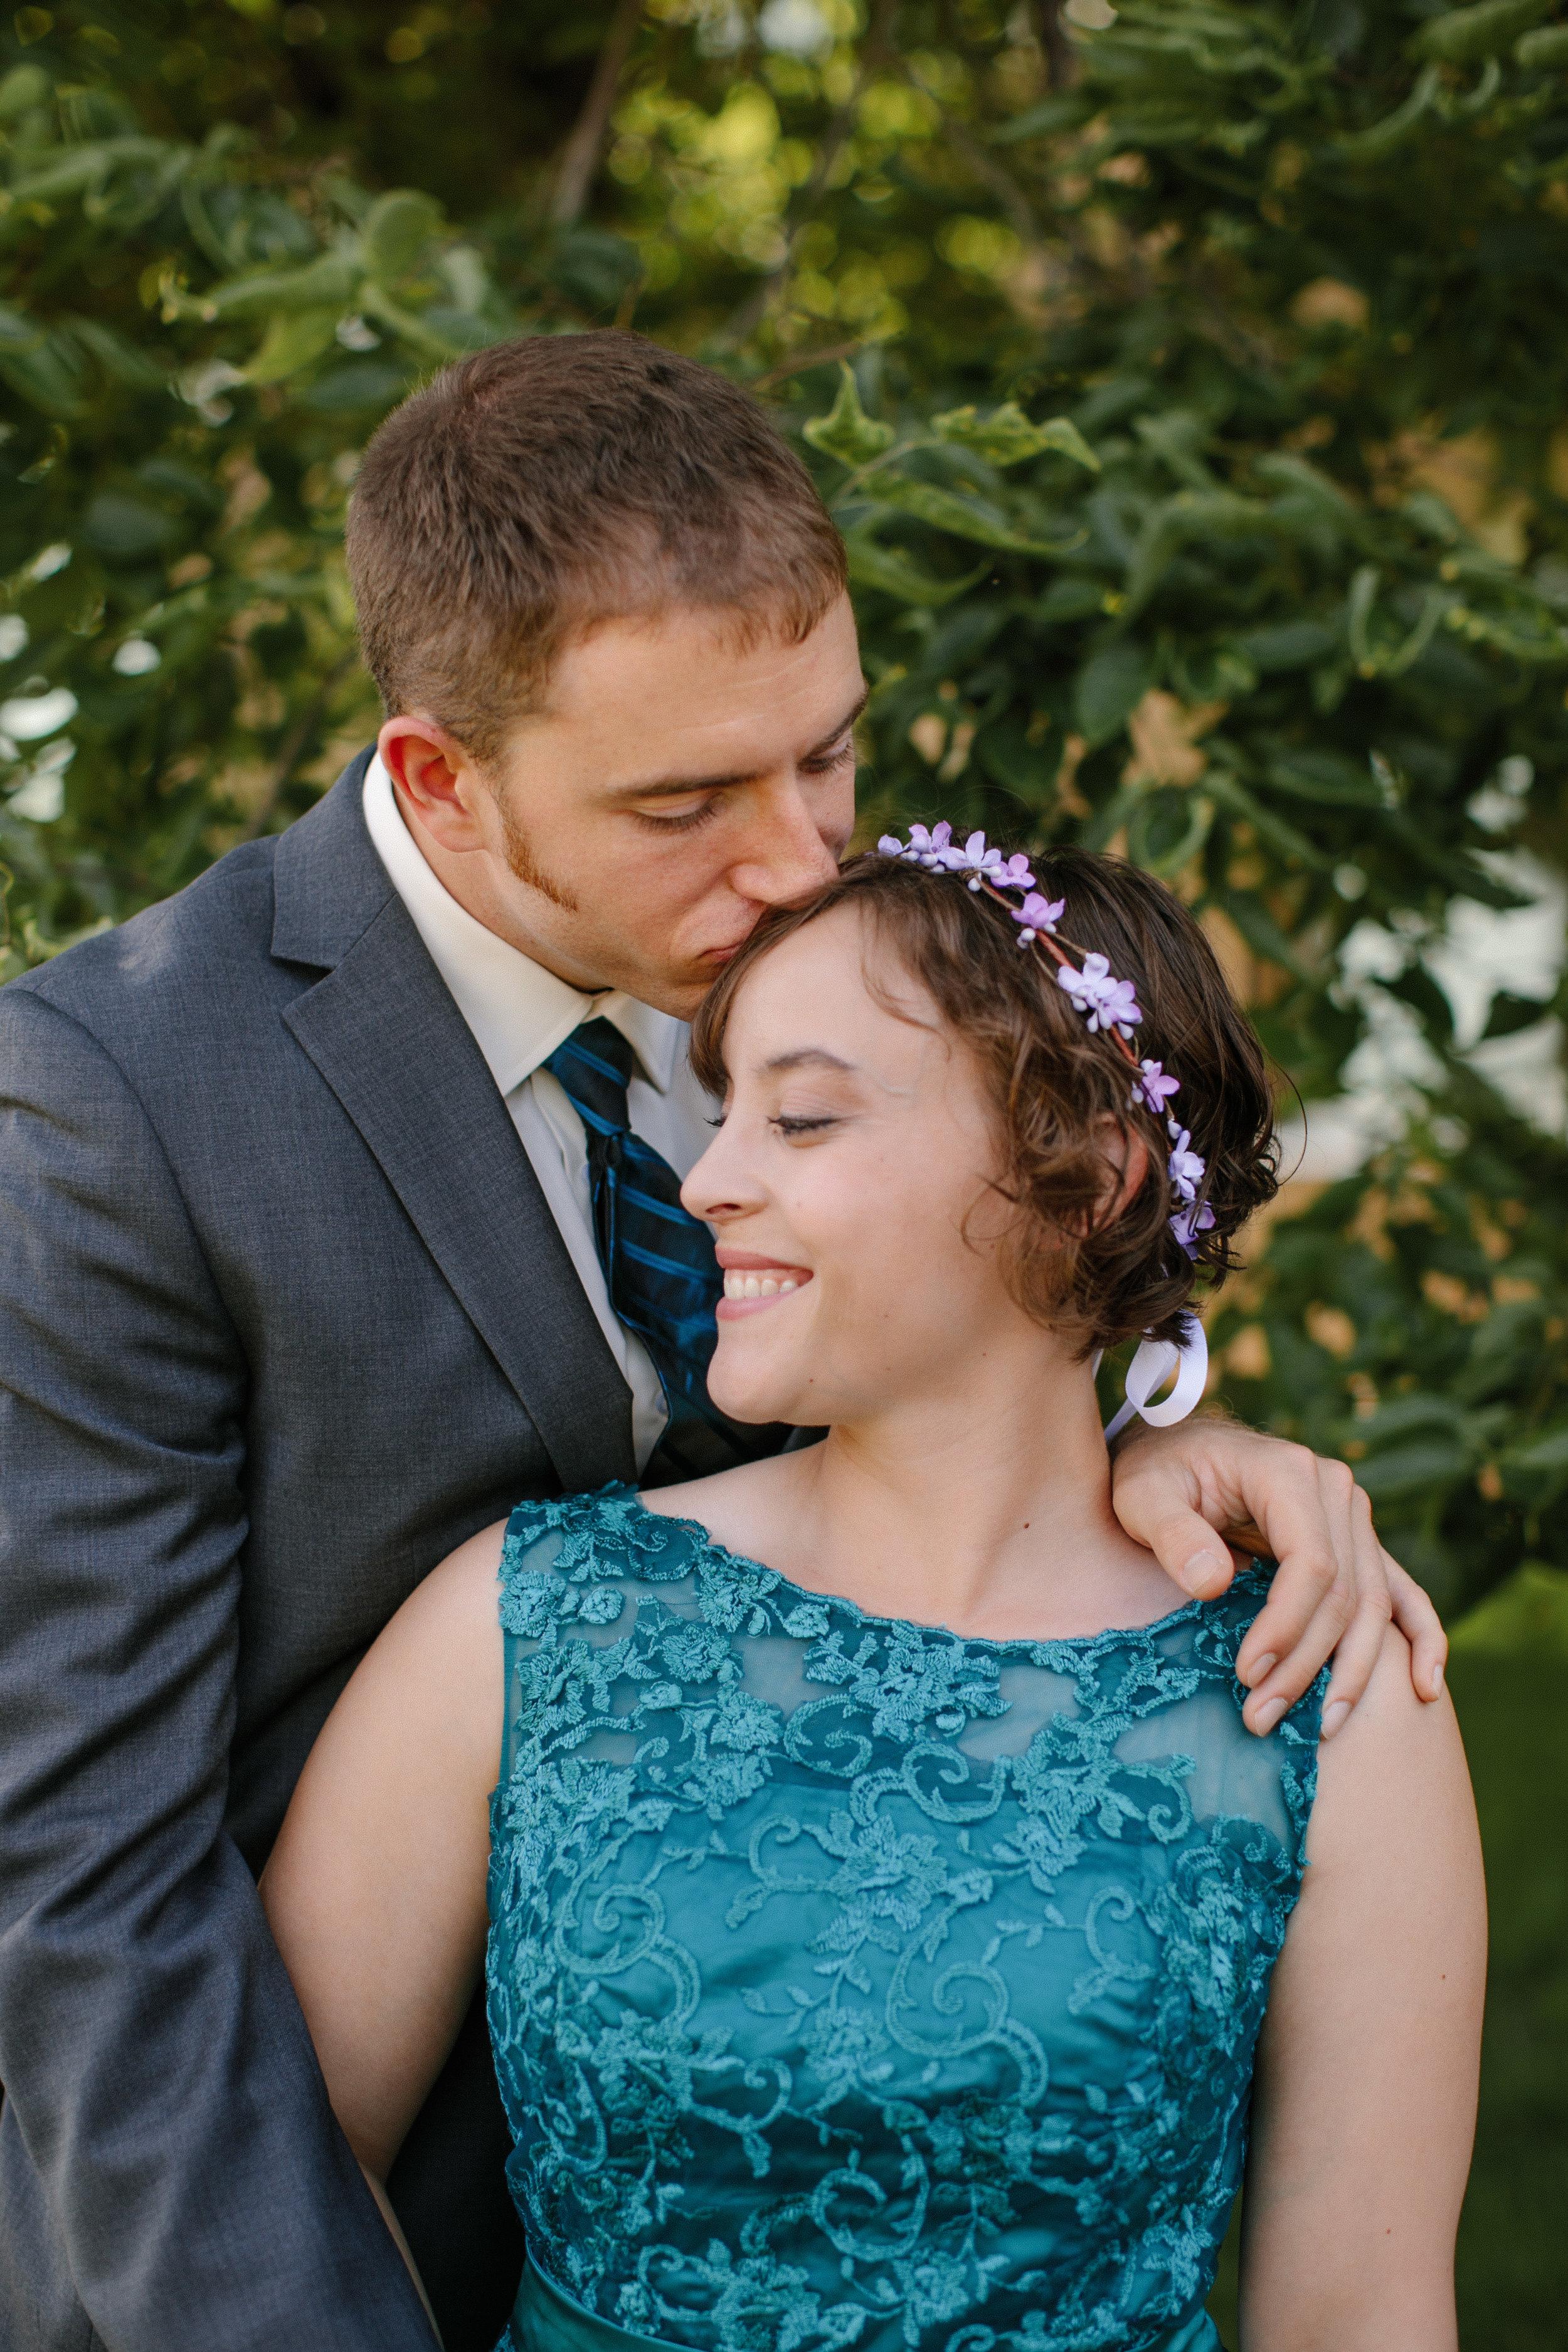 Minnesota twin cities wedding photographers under 3K $3000